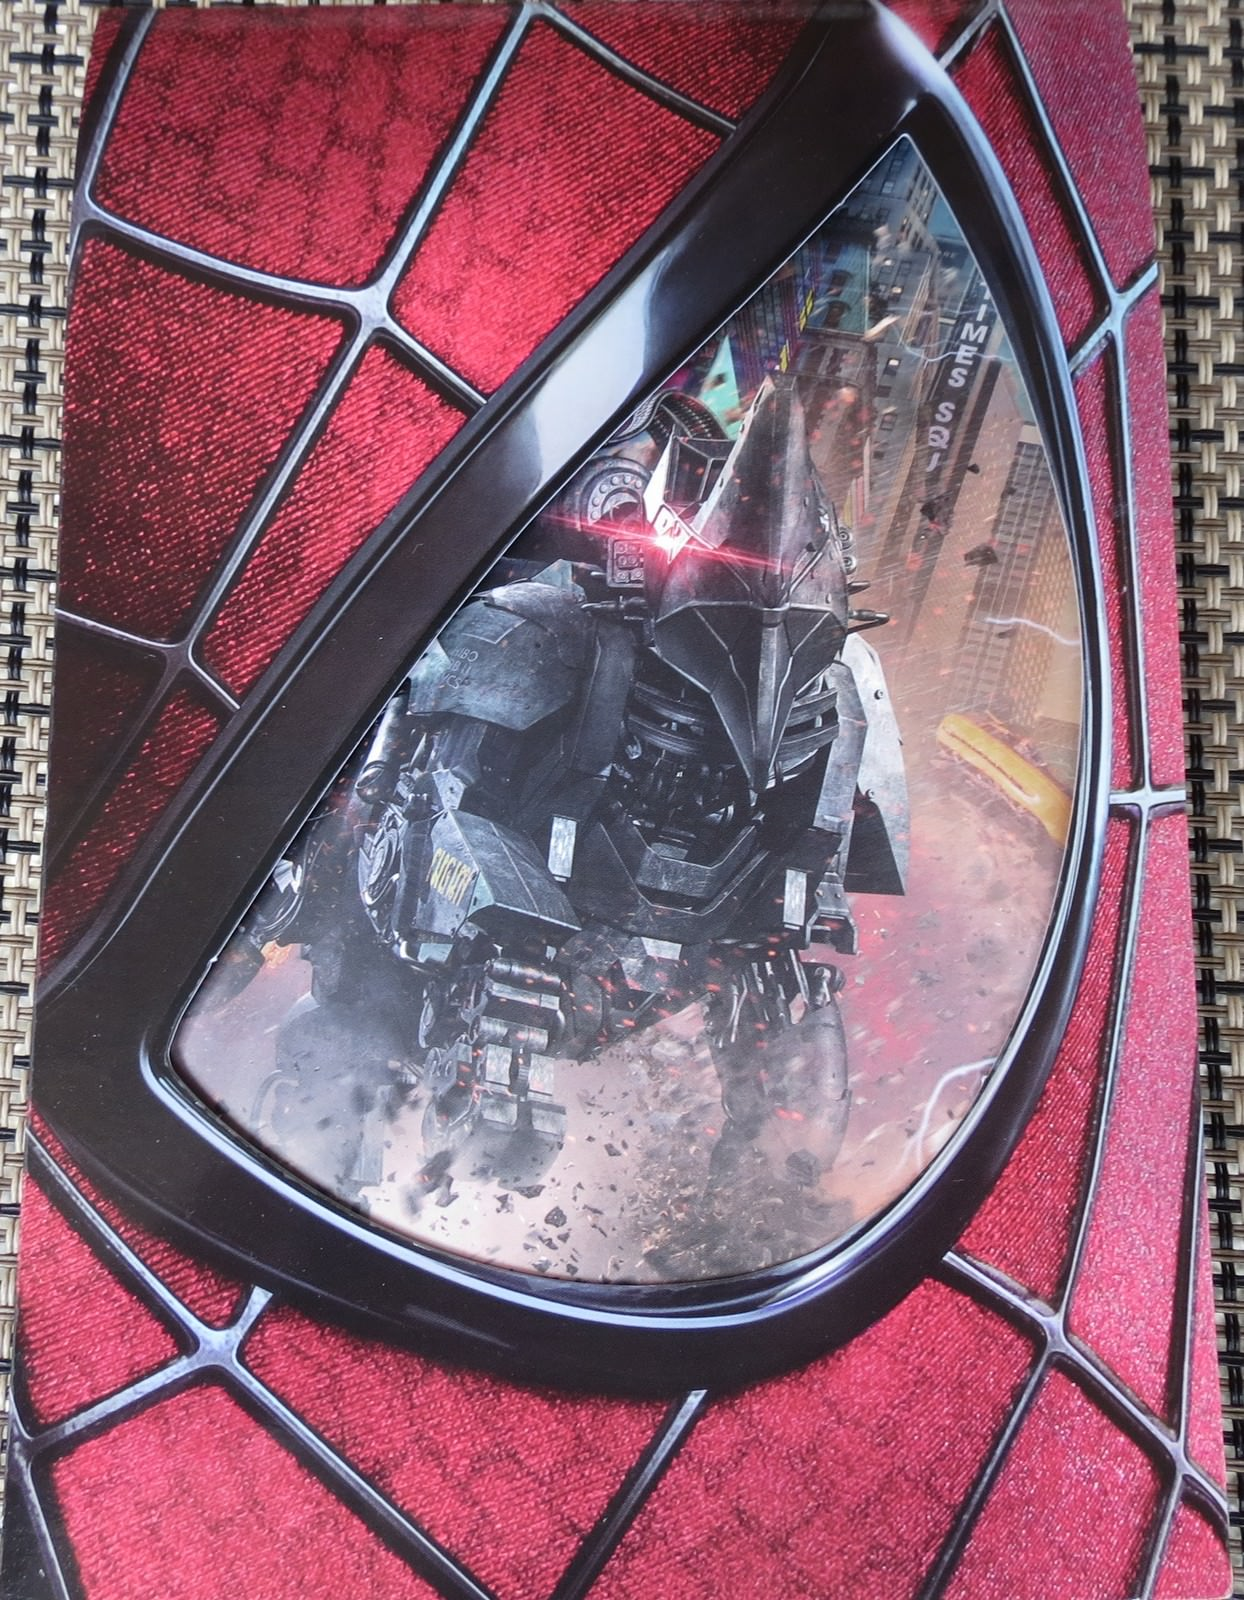 Movie, The Amazing Spider-Man 2(美國) / 蜘蛛人驚奇再起2:電光之戰(台) / 超凡蜘蛛侠2(中) / 蜘蛛俠2:決戰電魔(港), 特映會邀請卡